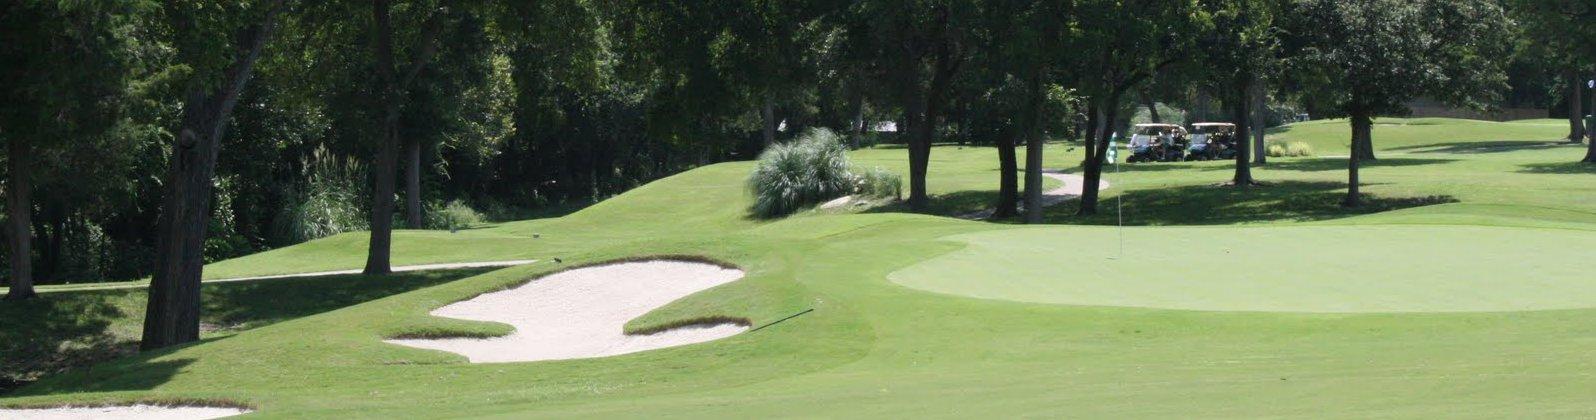 The Golf Club of Dallas Dallas Golf Courses Map on